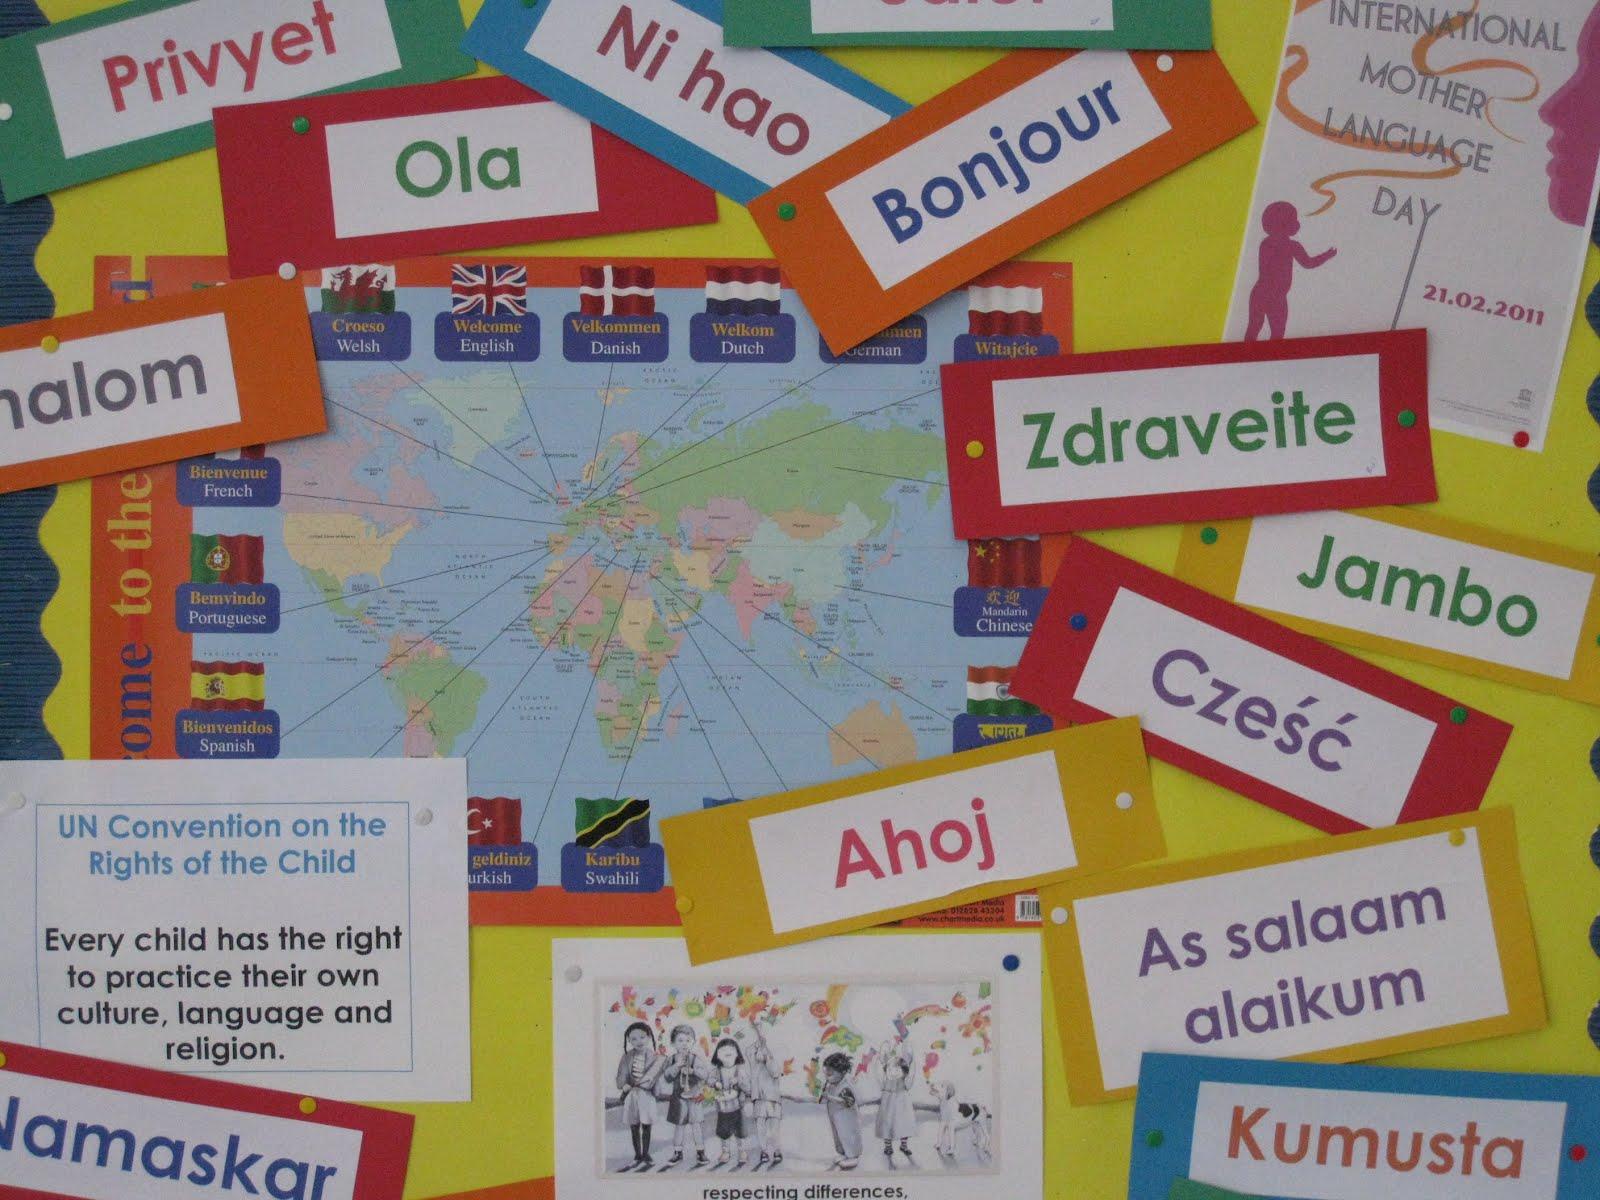 Pourquoi Pas International Mother Language Day